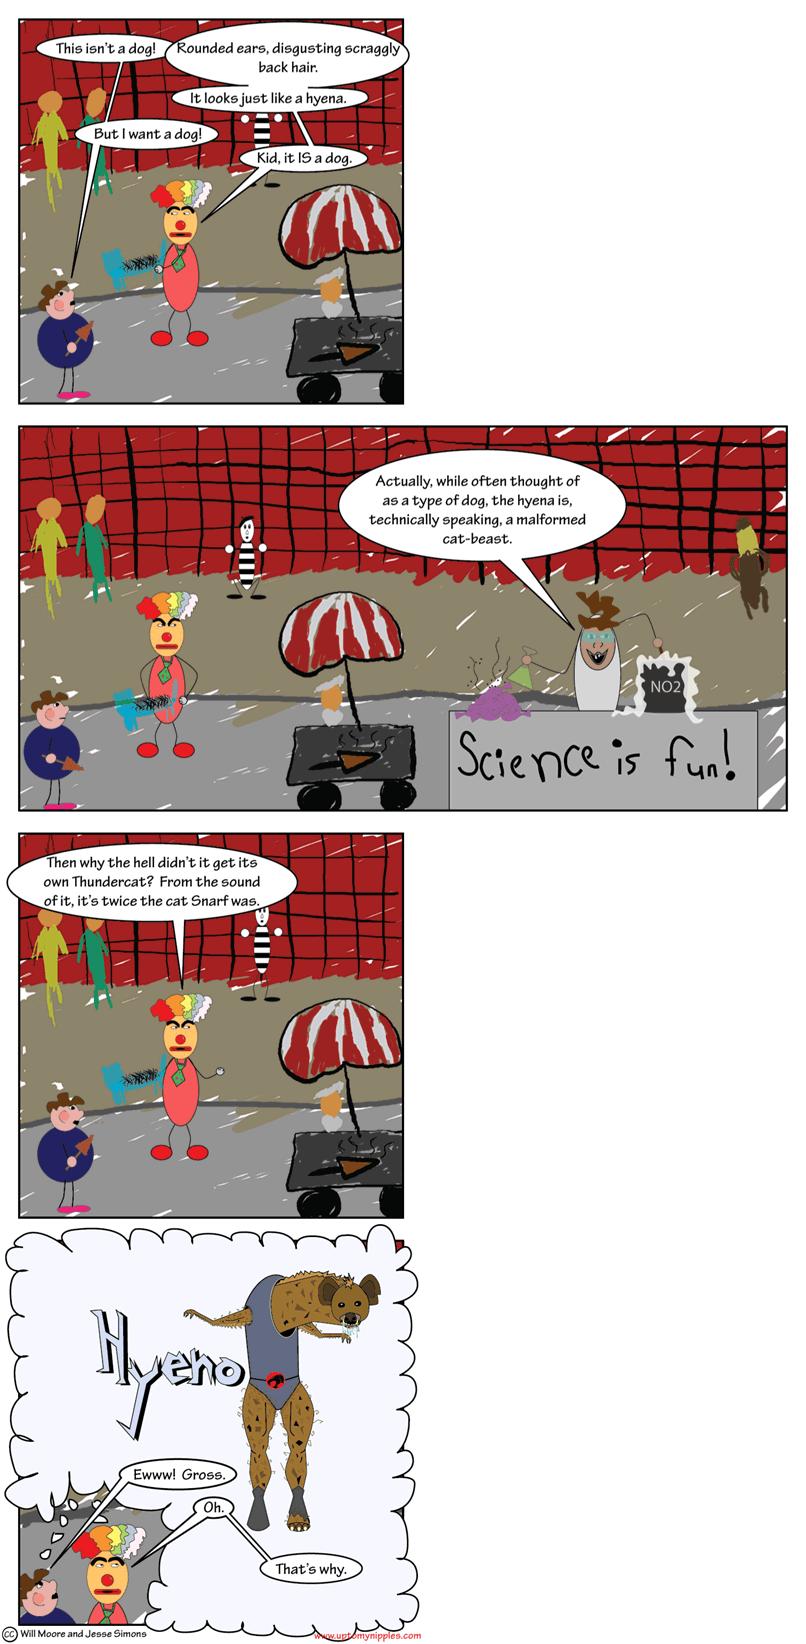 The Hyena comic